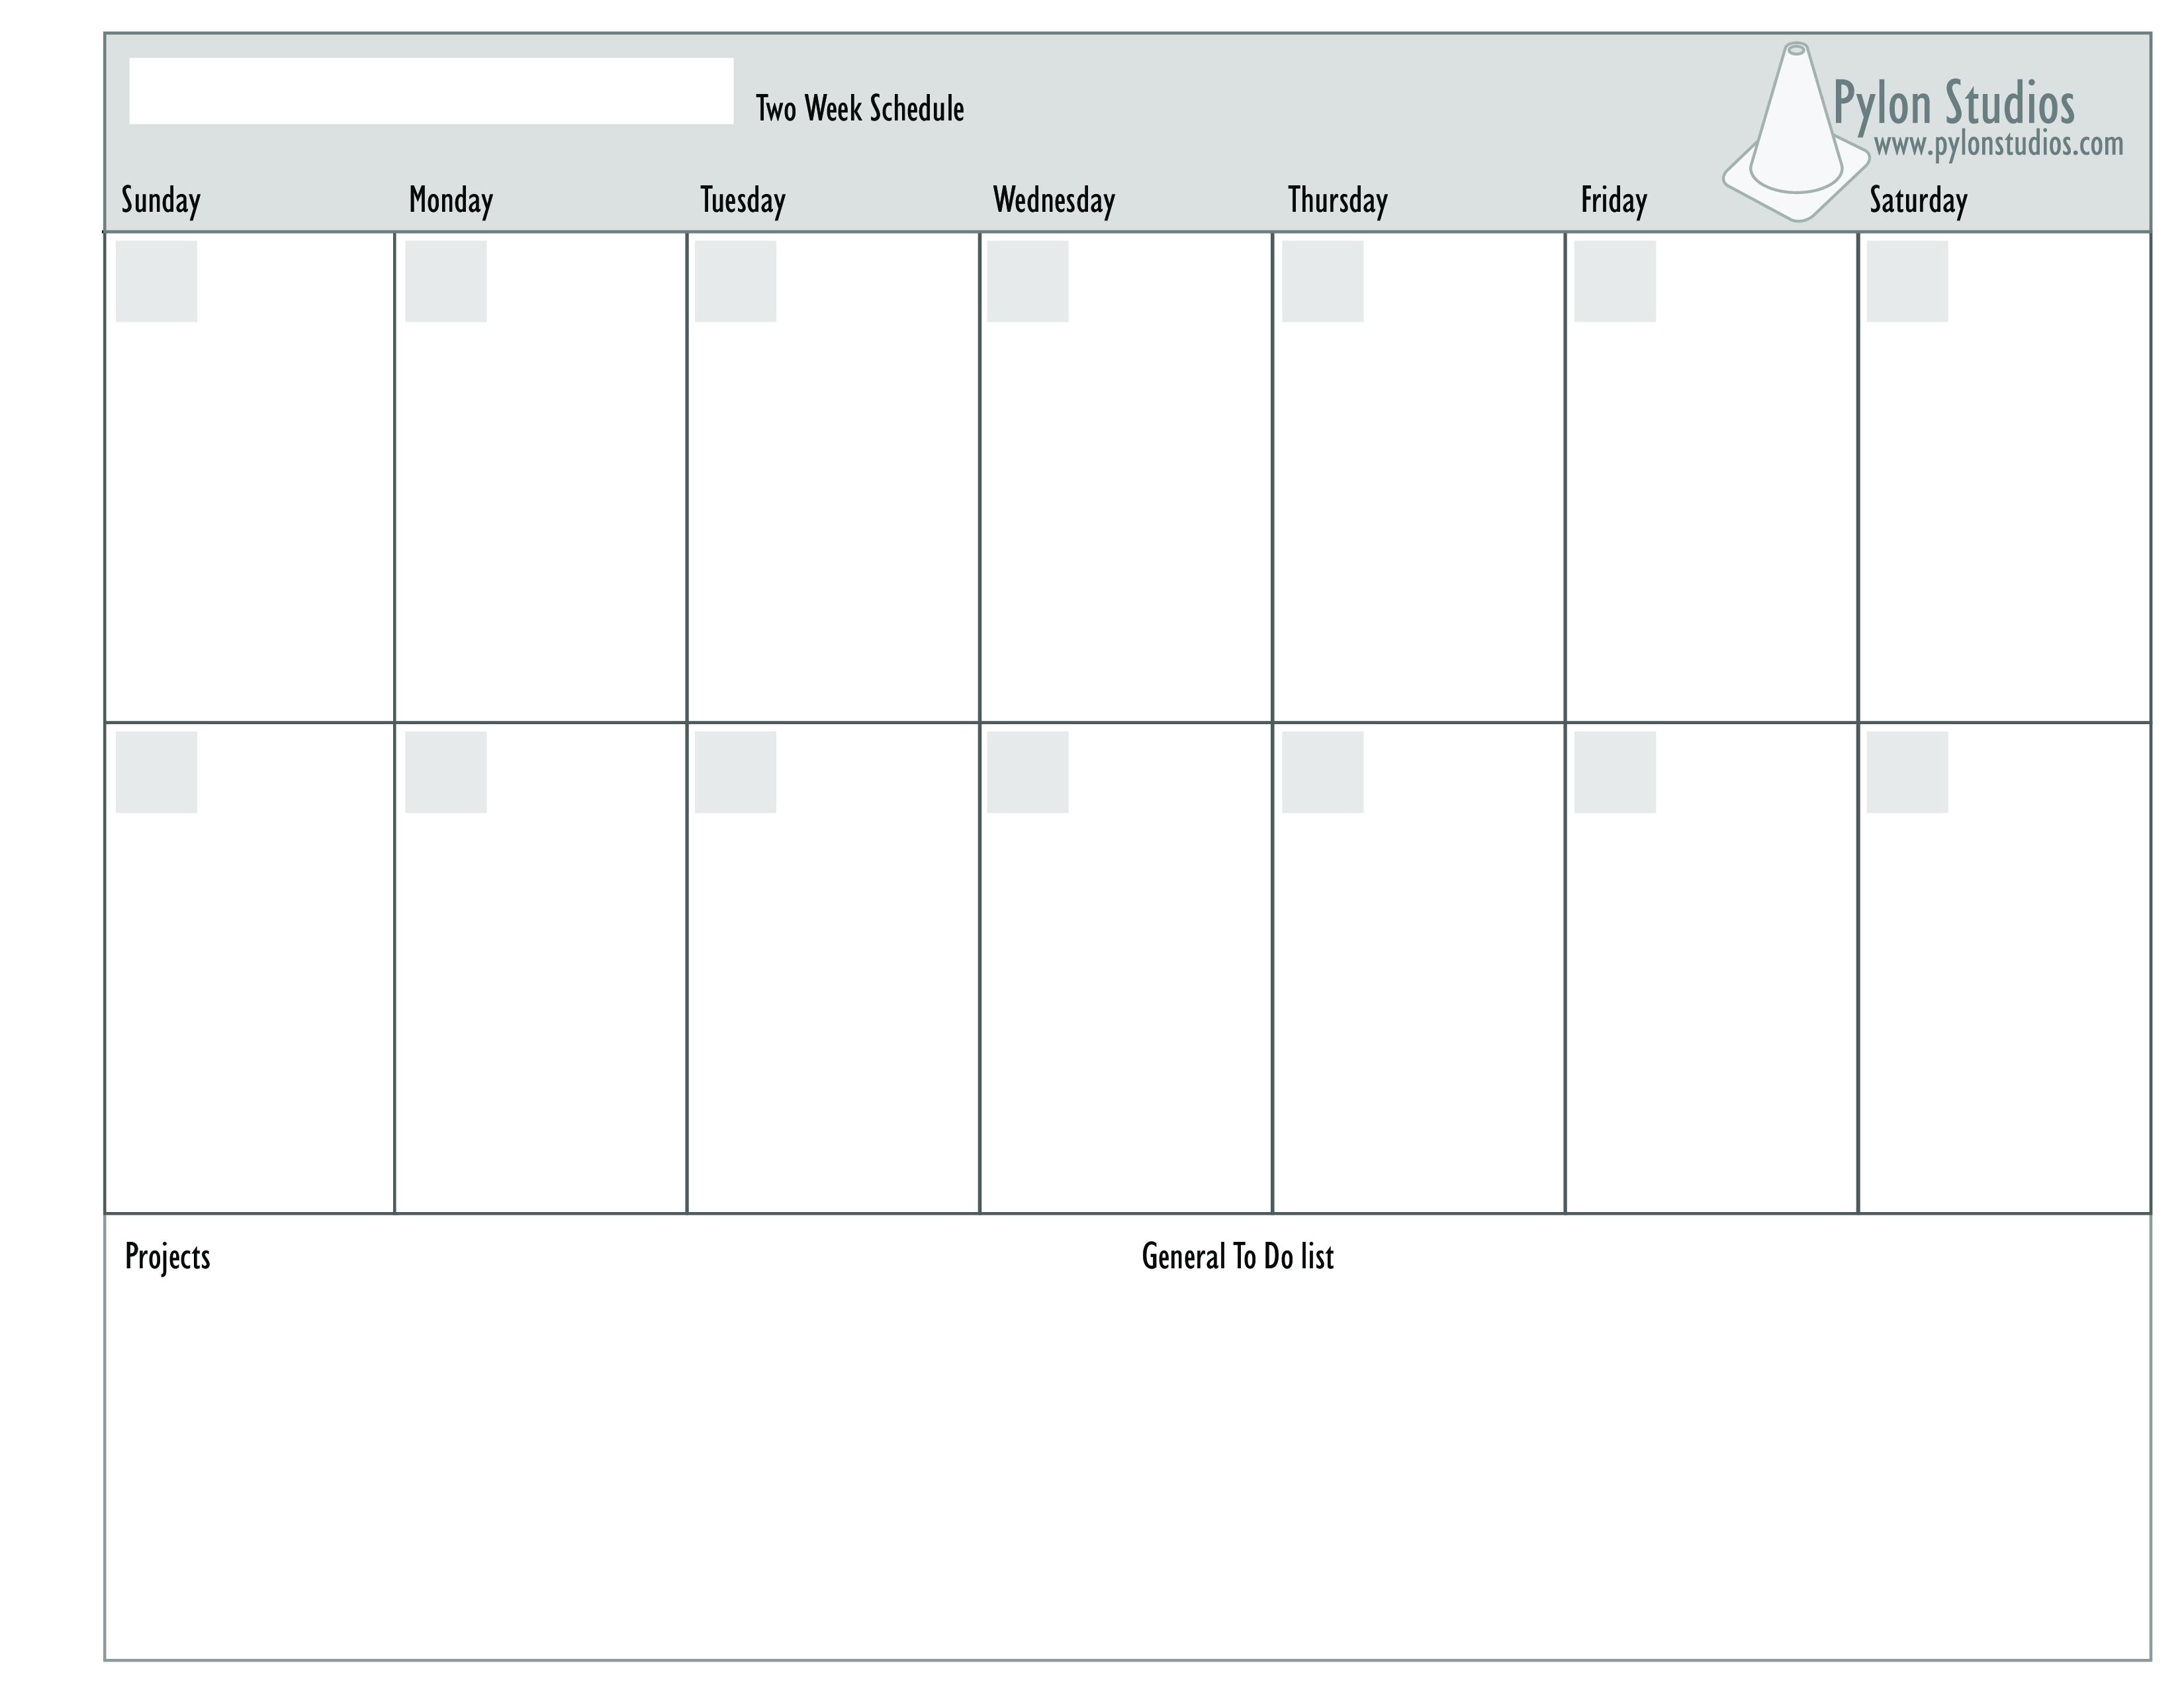 001 20Week Calendar Template Free Templates At Allbusinesstemplates inside Two Week Blank Calendar Template